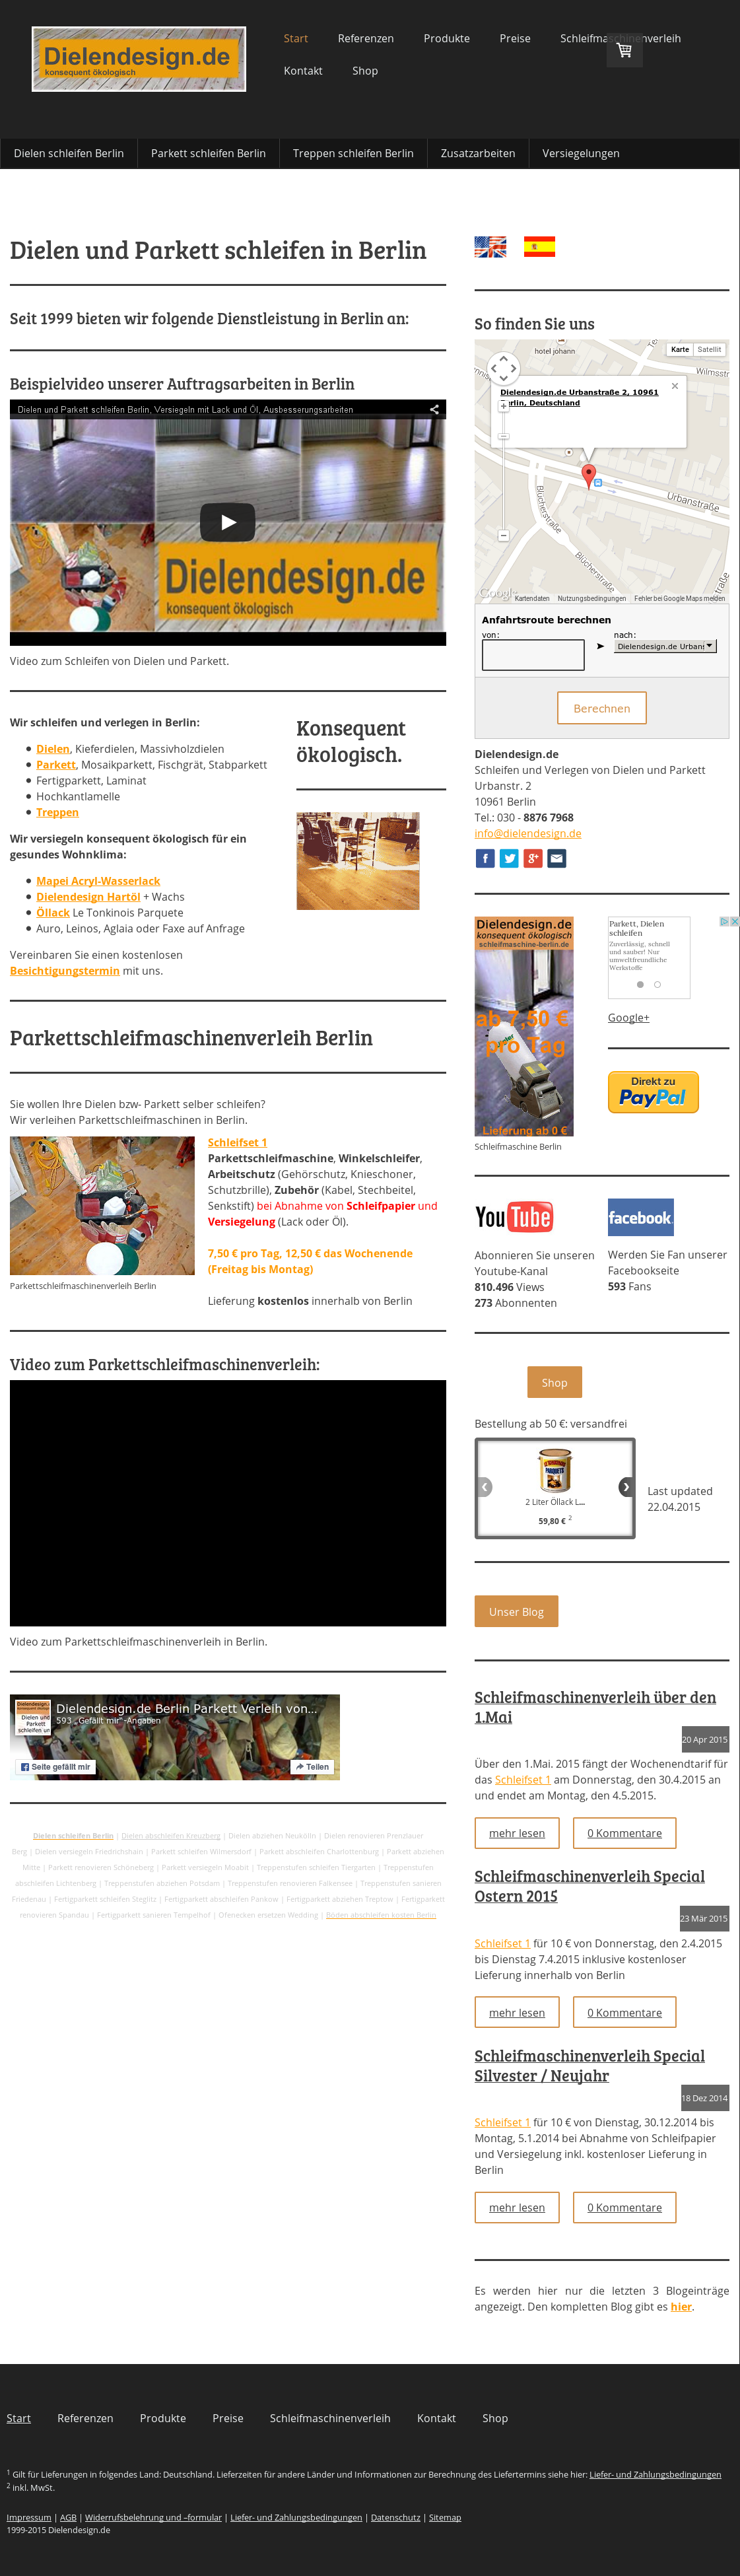 Owler Reports Dielendesign De Berlin Parkett Verleih Von